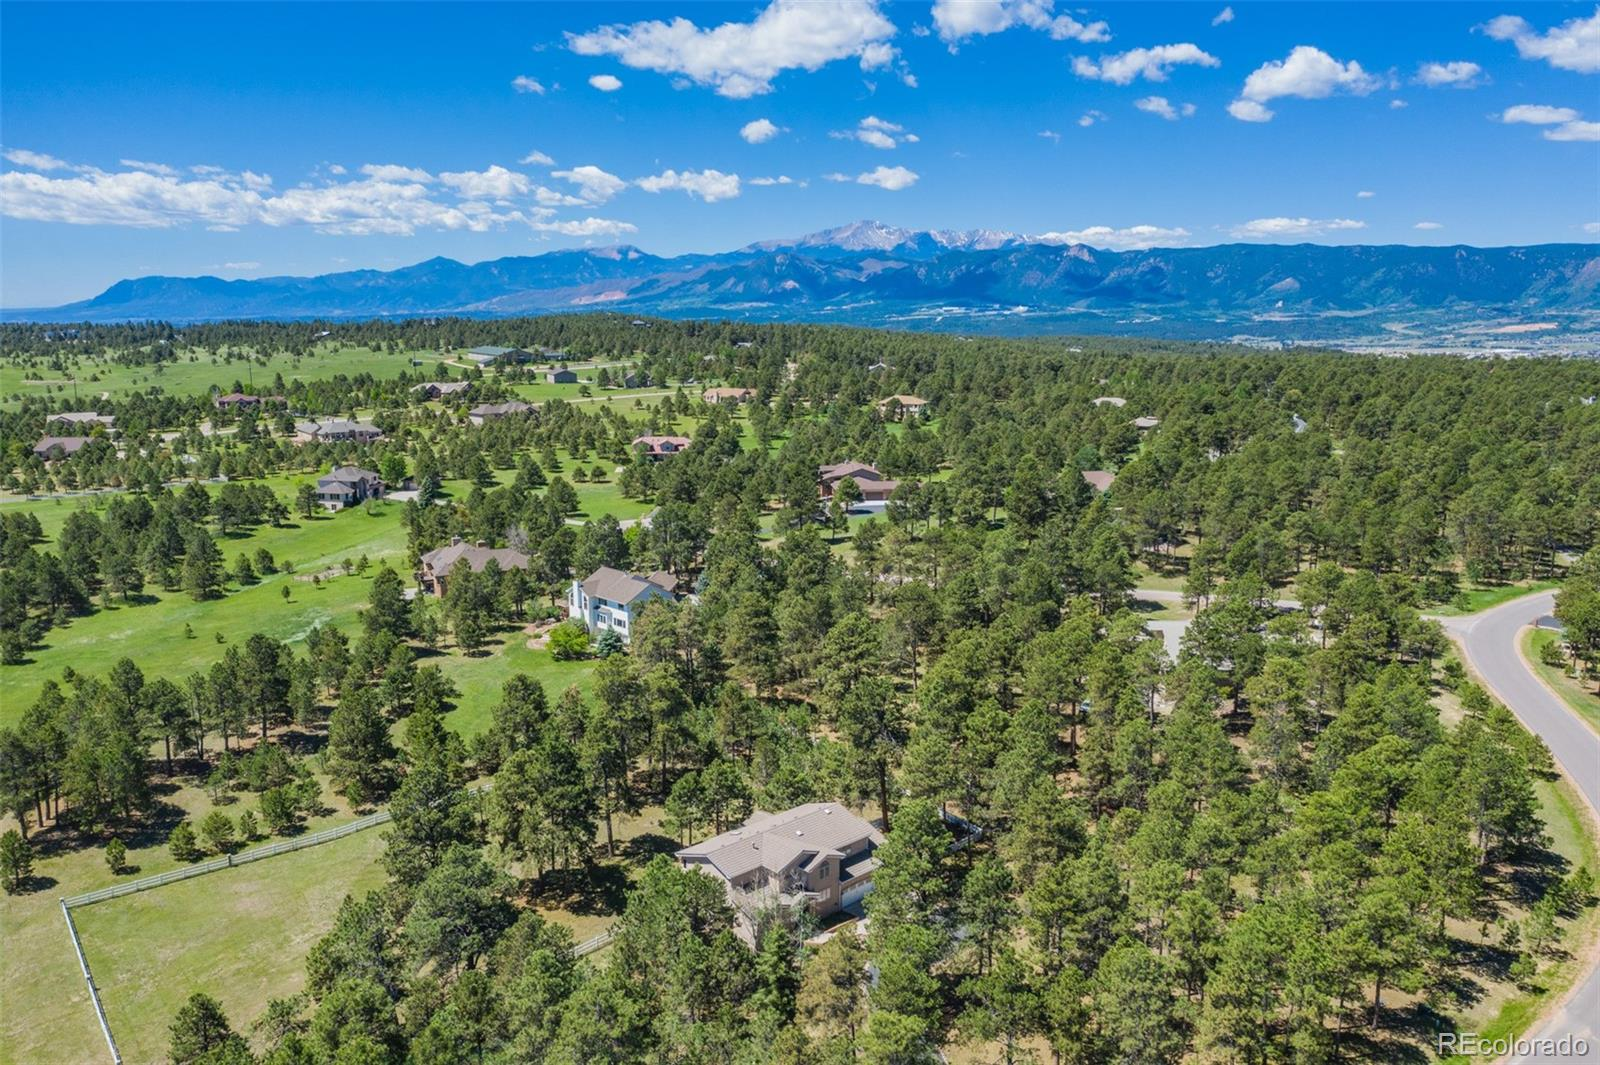 MLS# 2707350 - 8 - 17310 Charter Pines , Colorado Springs, CO 80132